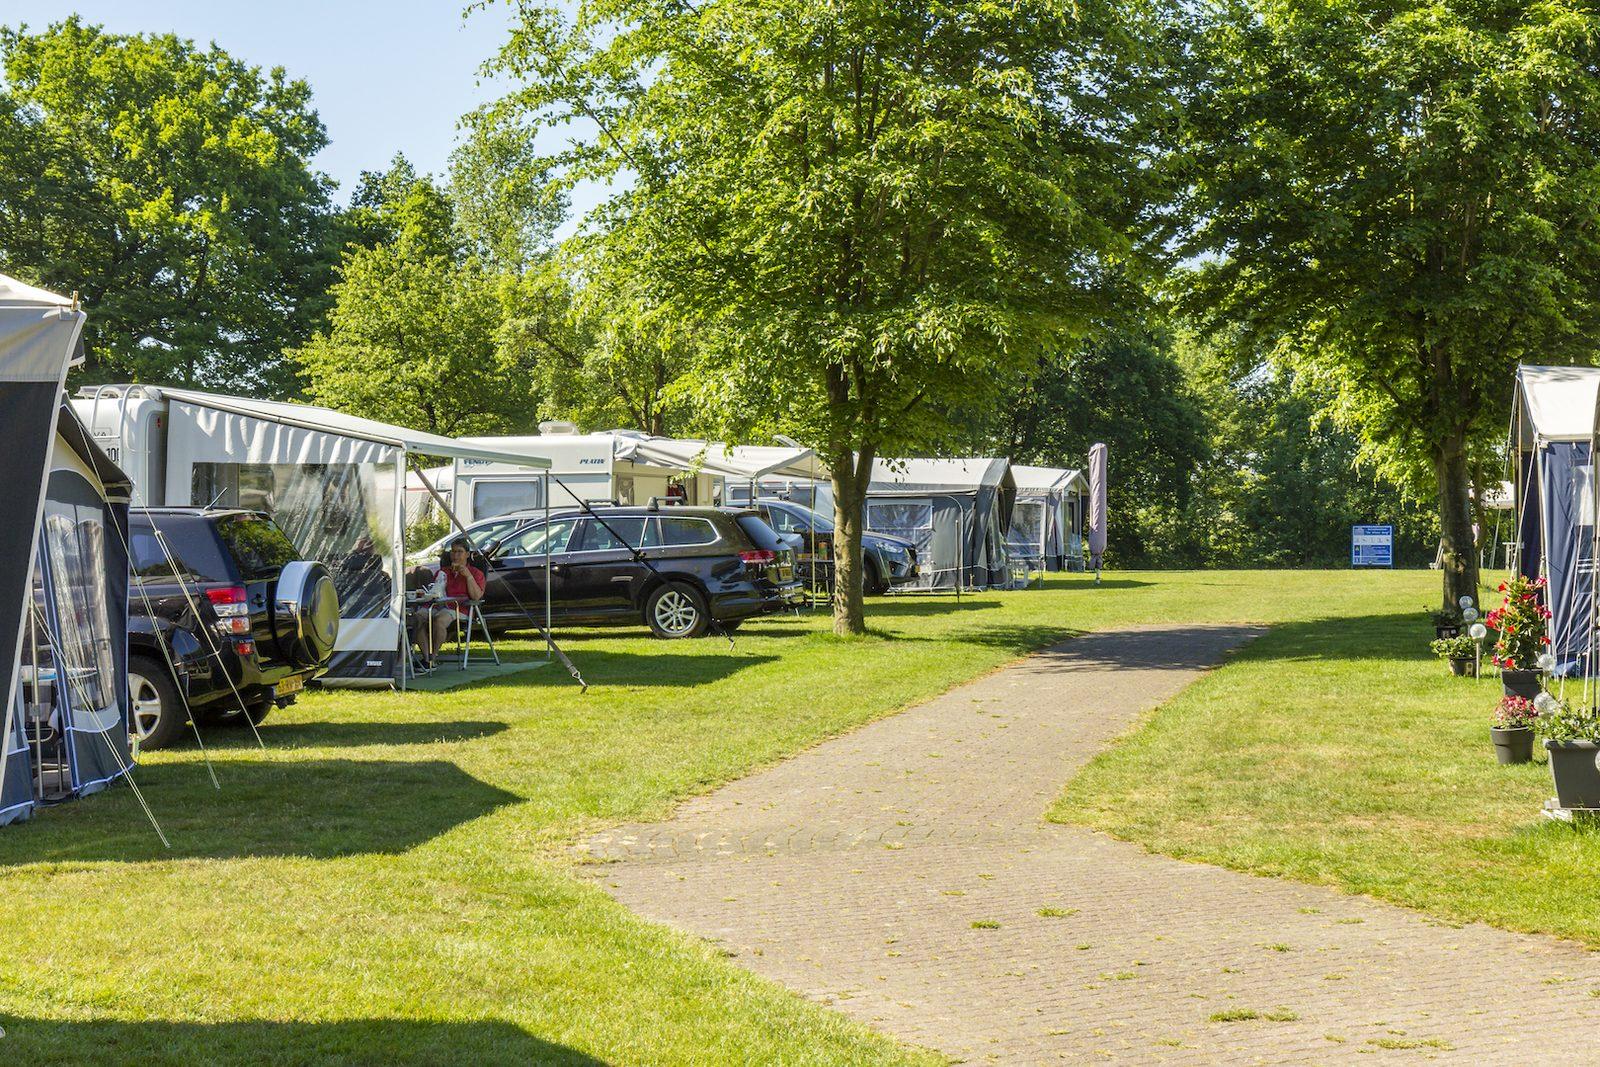 Camping Ootmarsum